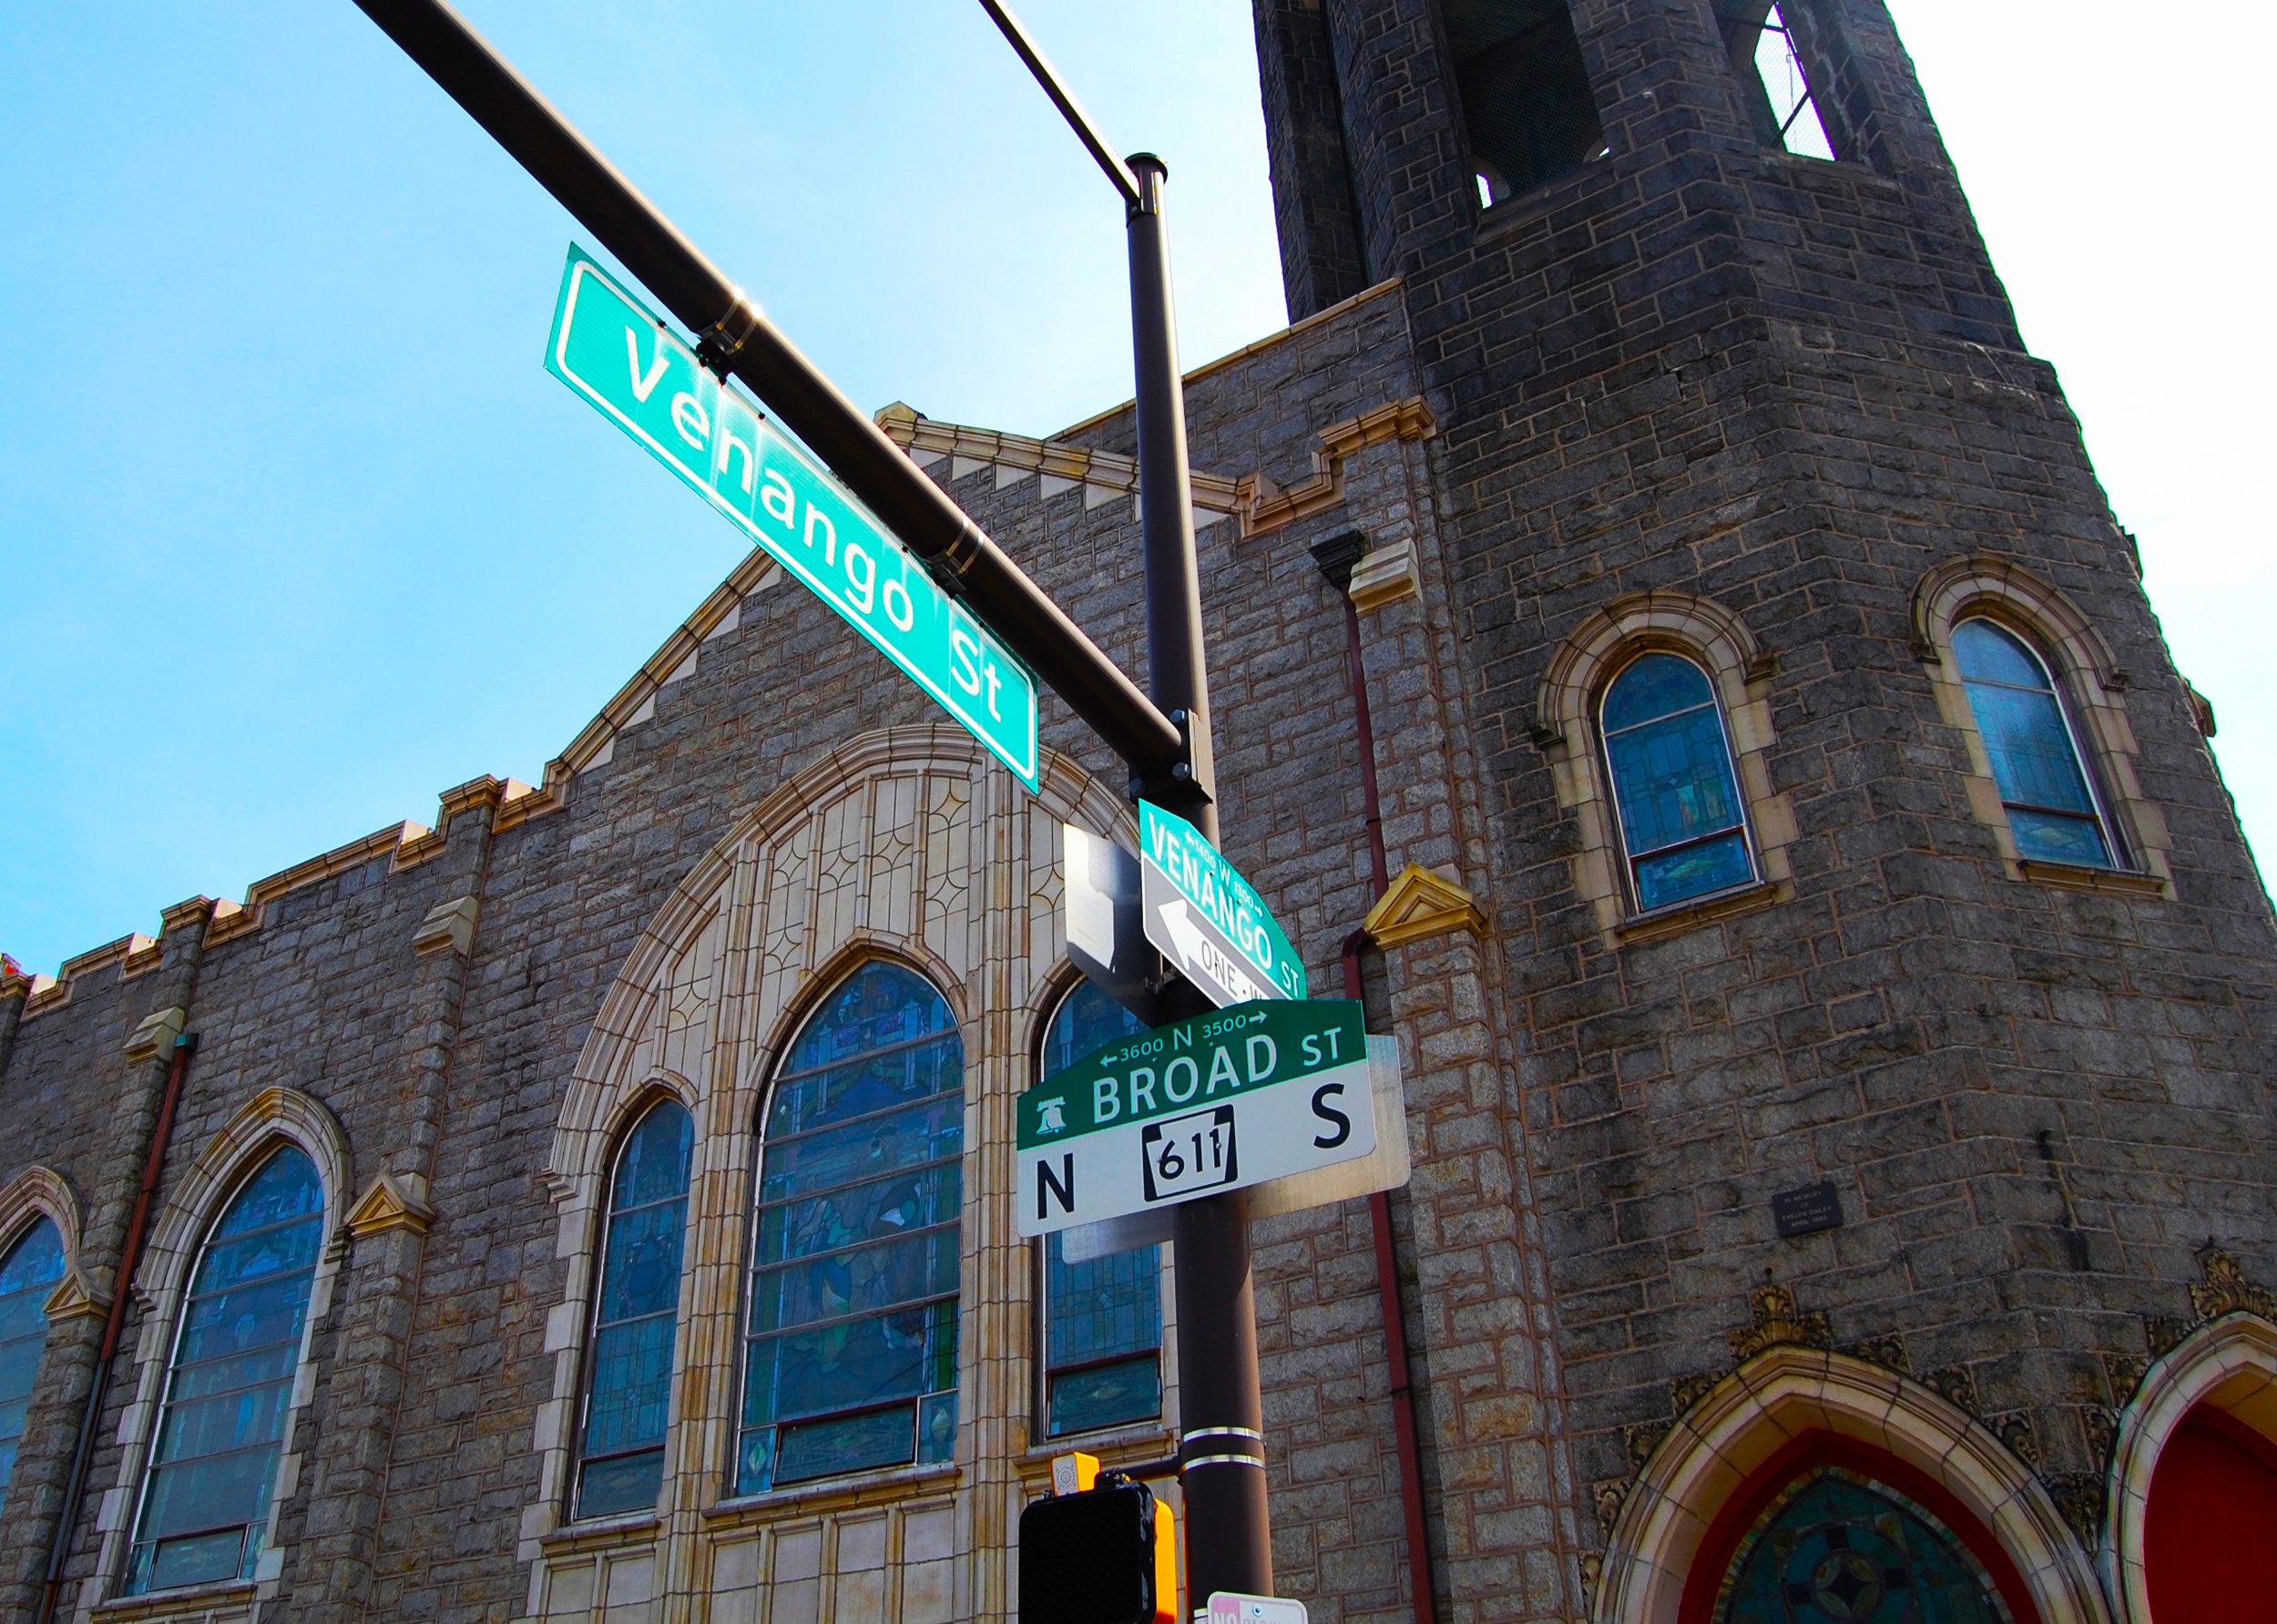 Corridor Connections - 3600/3601 North Broad Street | Nicetown-TiogaCongregation: Zion Baptist ChurchCommunity Partner: Called to Serve CDCDesign Partner: Studio 6mm (lead); Kate Cowing Architect LLC; Keast & Hood; Burns Engineering, Inc.; International Consultants, Inc.